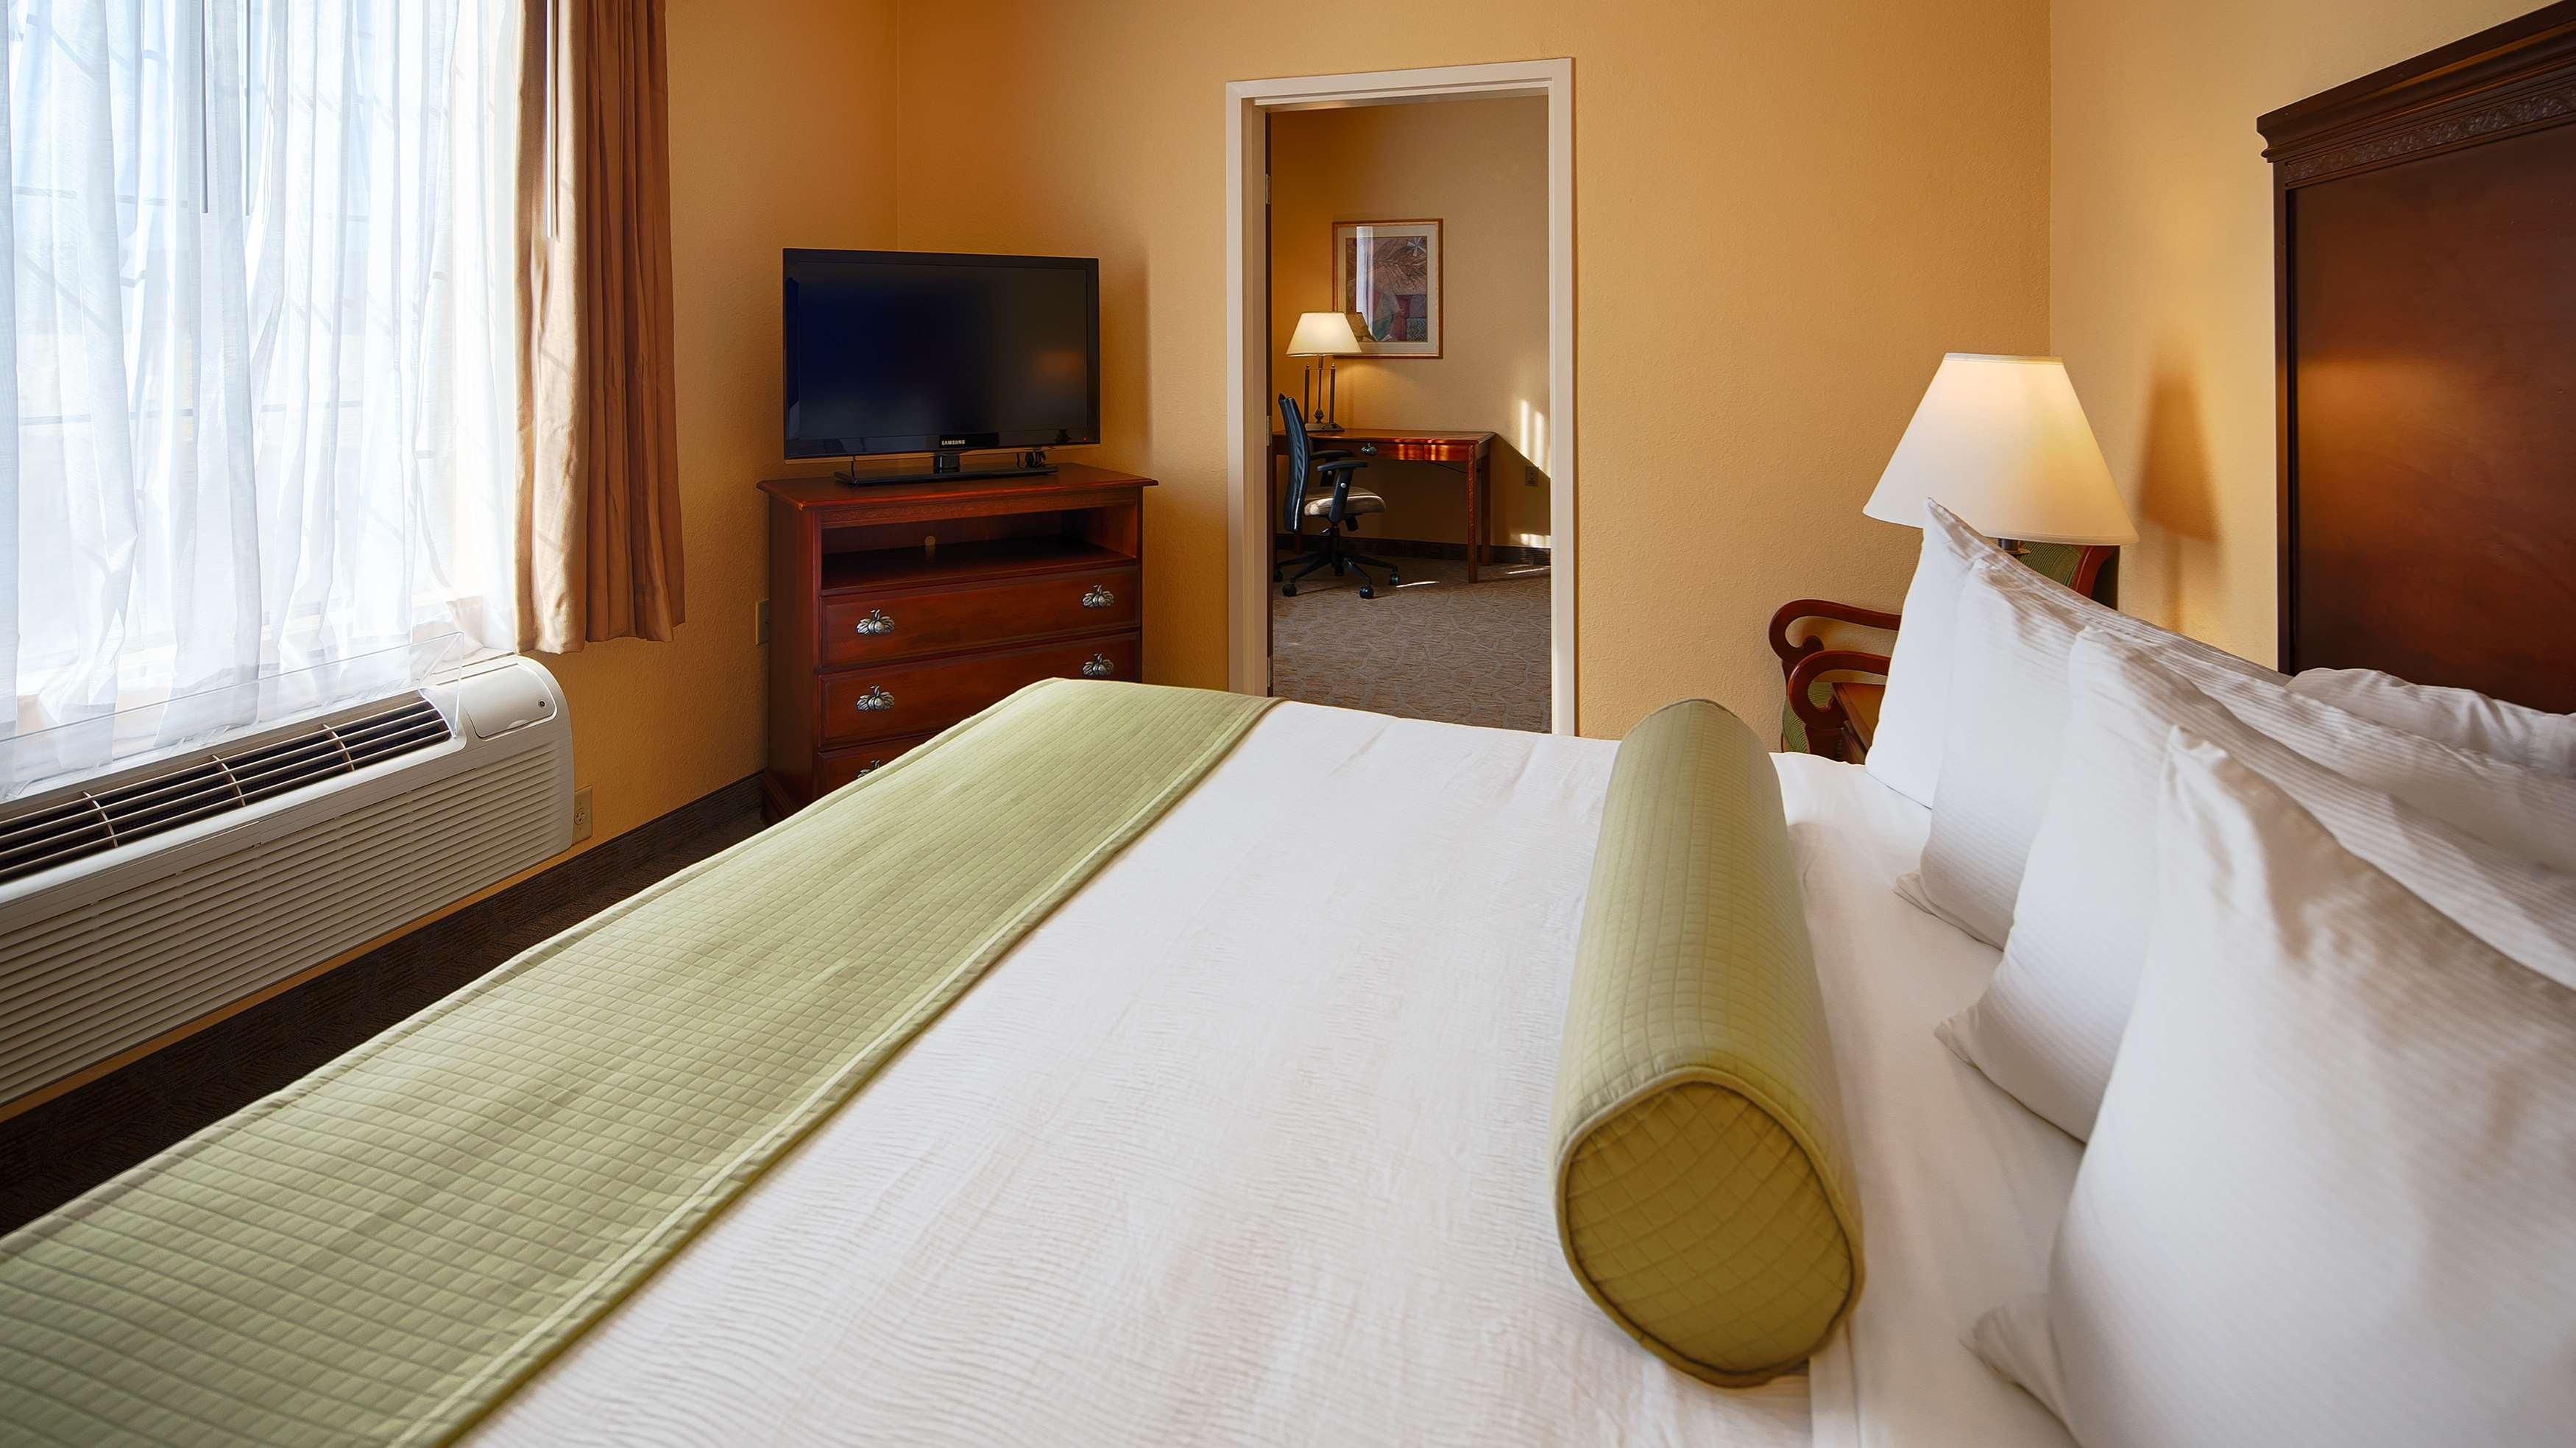 Best Western Plus Executive Hotel & Suites image 27